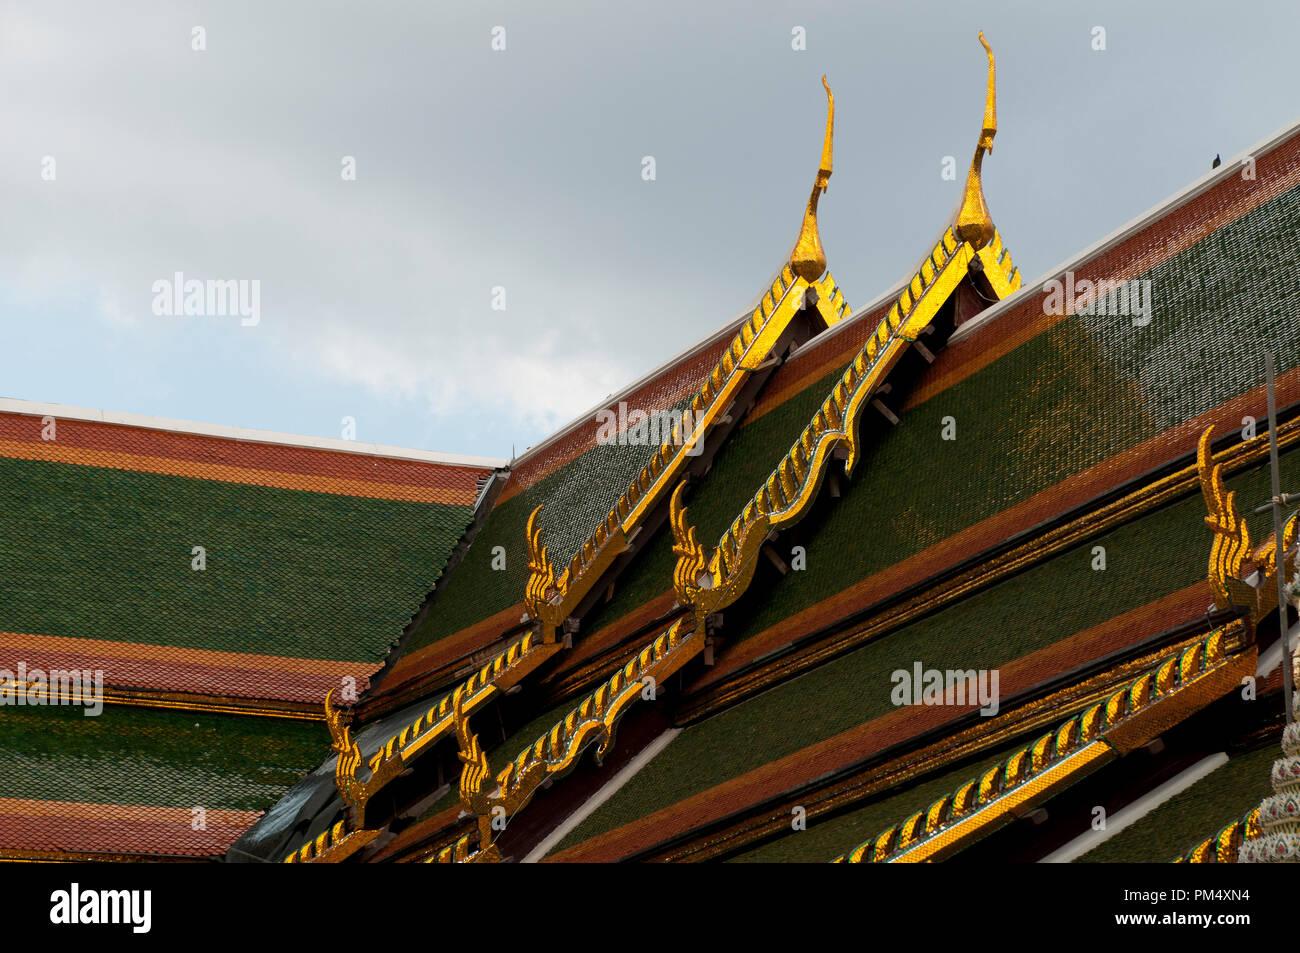 Roof - Wat Arun - Temple of dawn - Bangkok - Thailand Toits - Wat Arun - Temple de l'Aube - Bangkok - Thaïlande Stock Photo